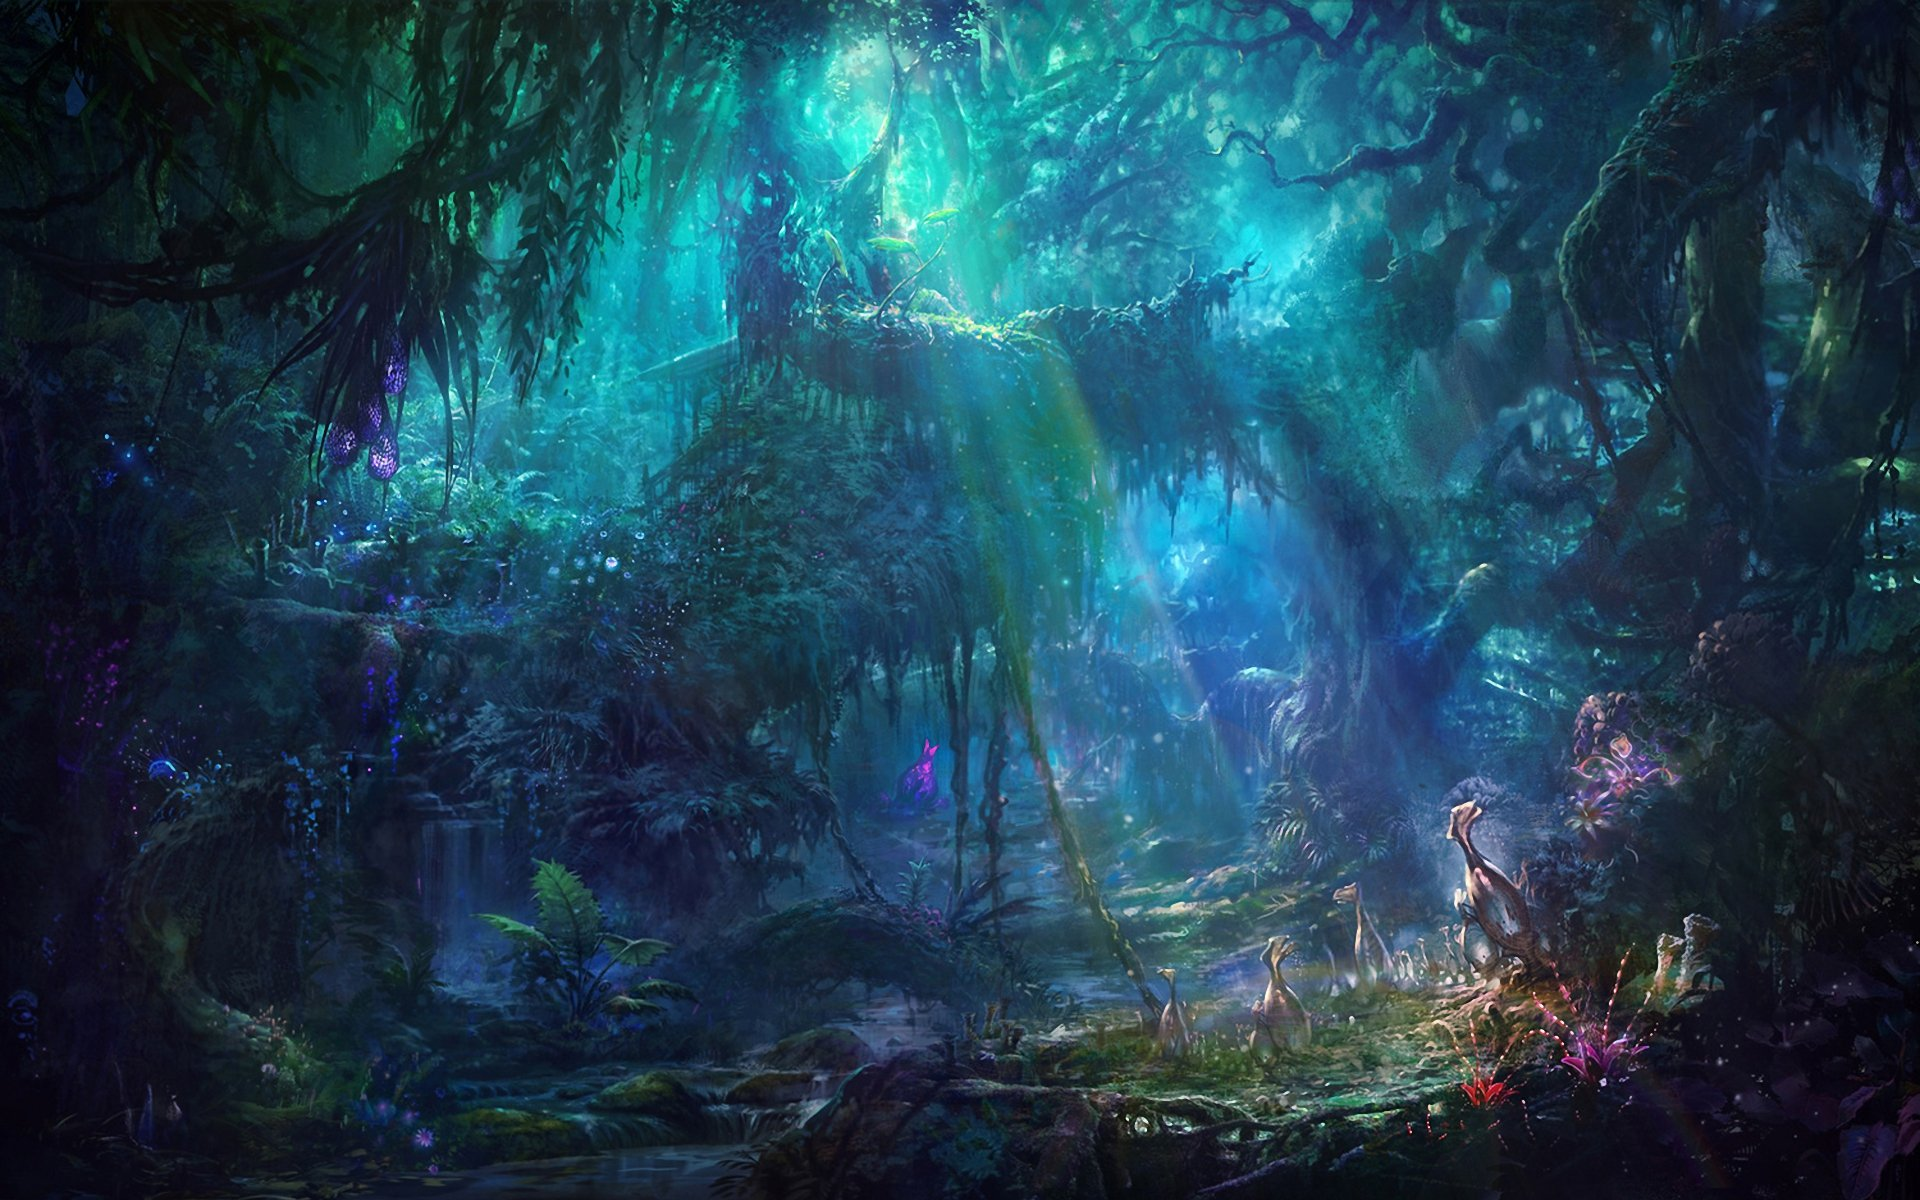 Enchanting forest Computer Wallpapers Desktop Backgrounds 1920x1200 1920x1200